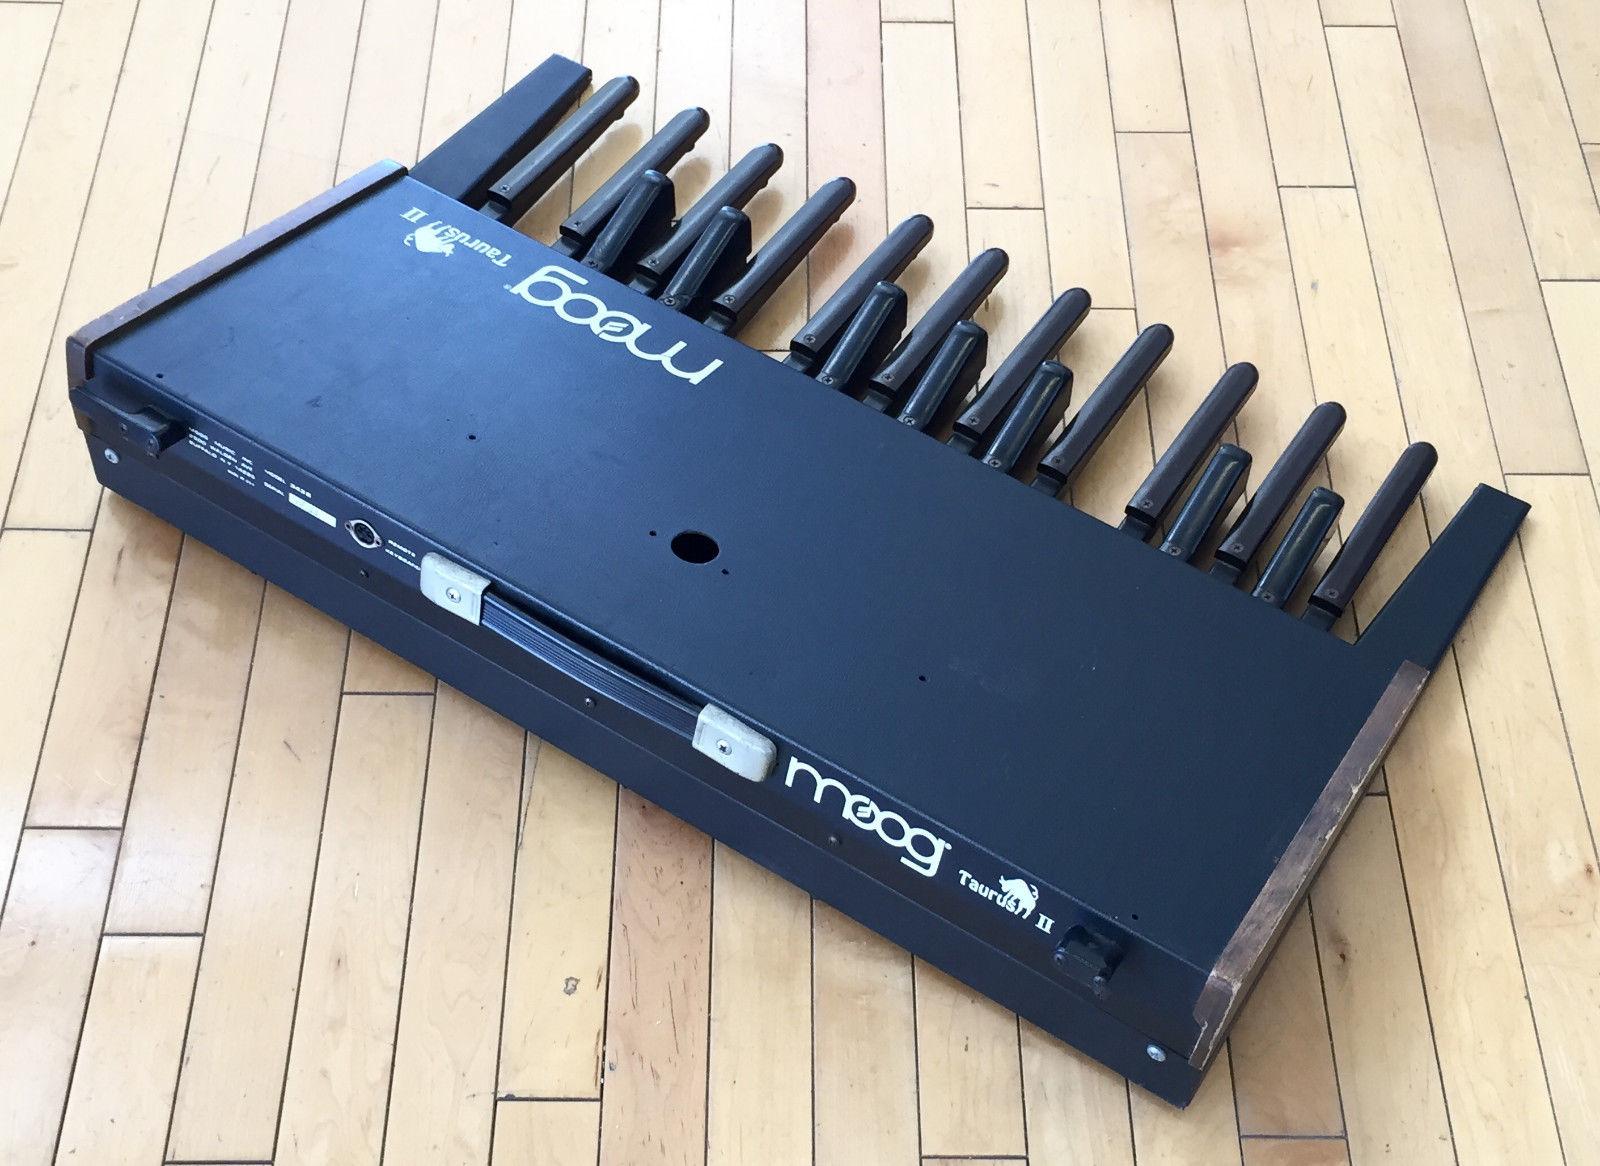 matrixsynth vintage moog taurus ii bass pedals sn 1833. Black Bedroom Furniture Sets. Home Design Ideas